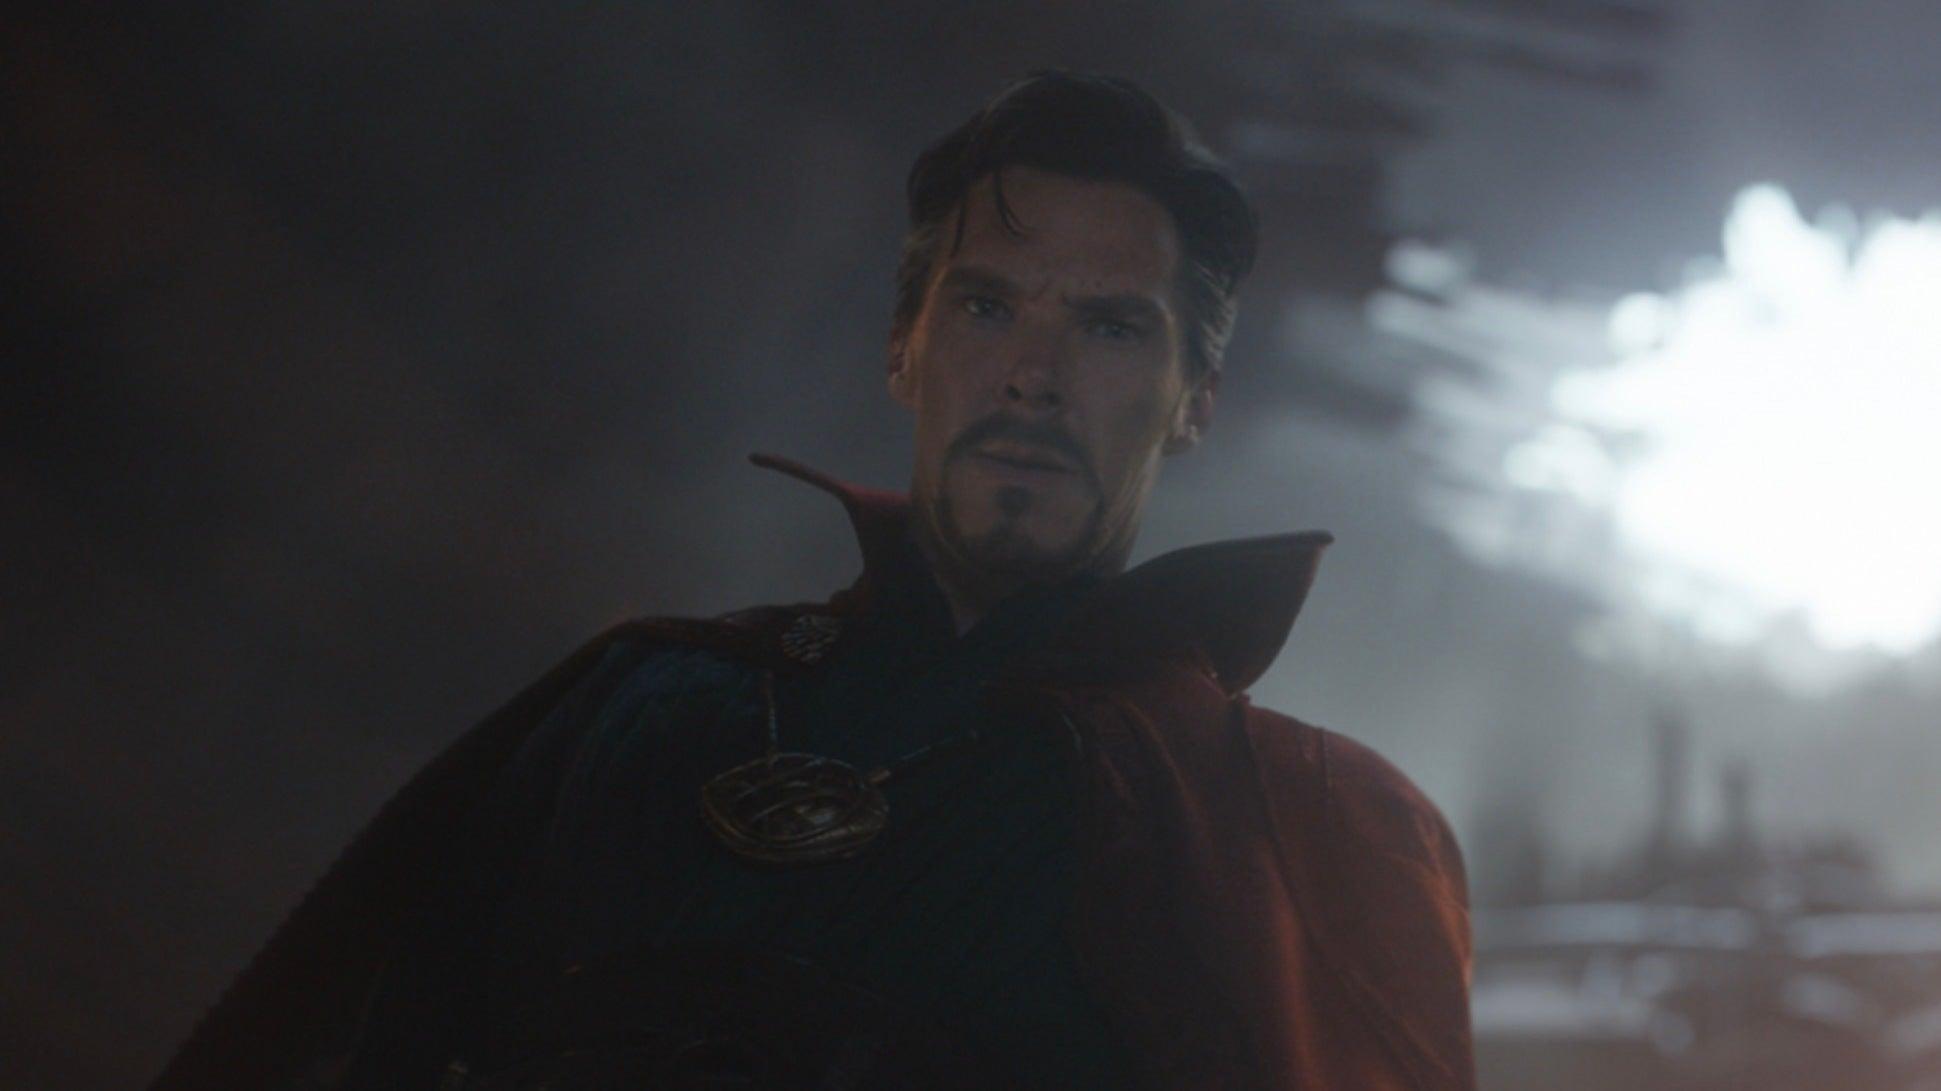 Director Scott Derrickson Is Coming Back For More Doctor Strange